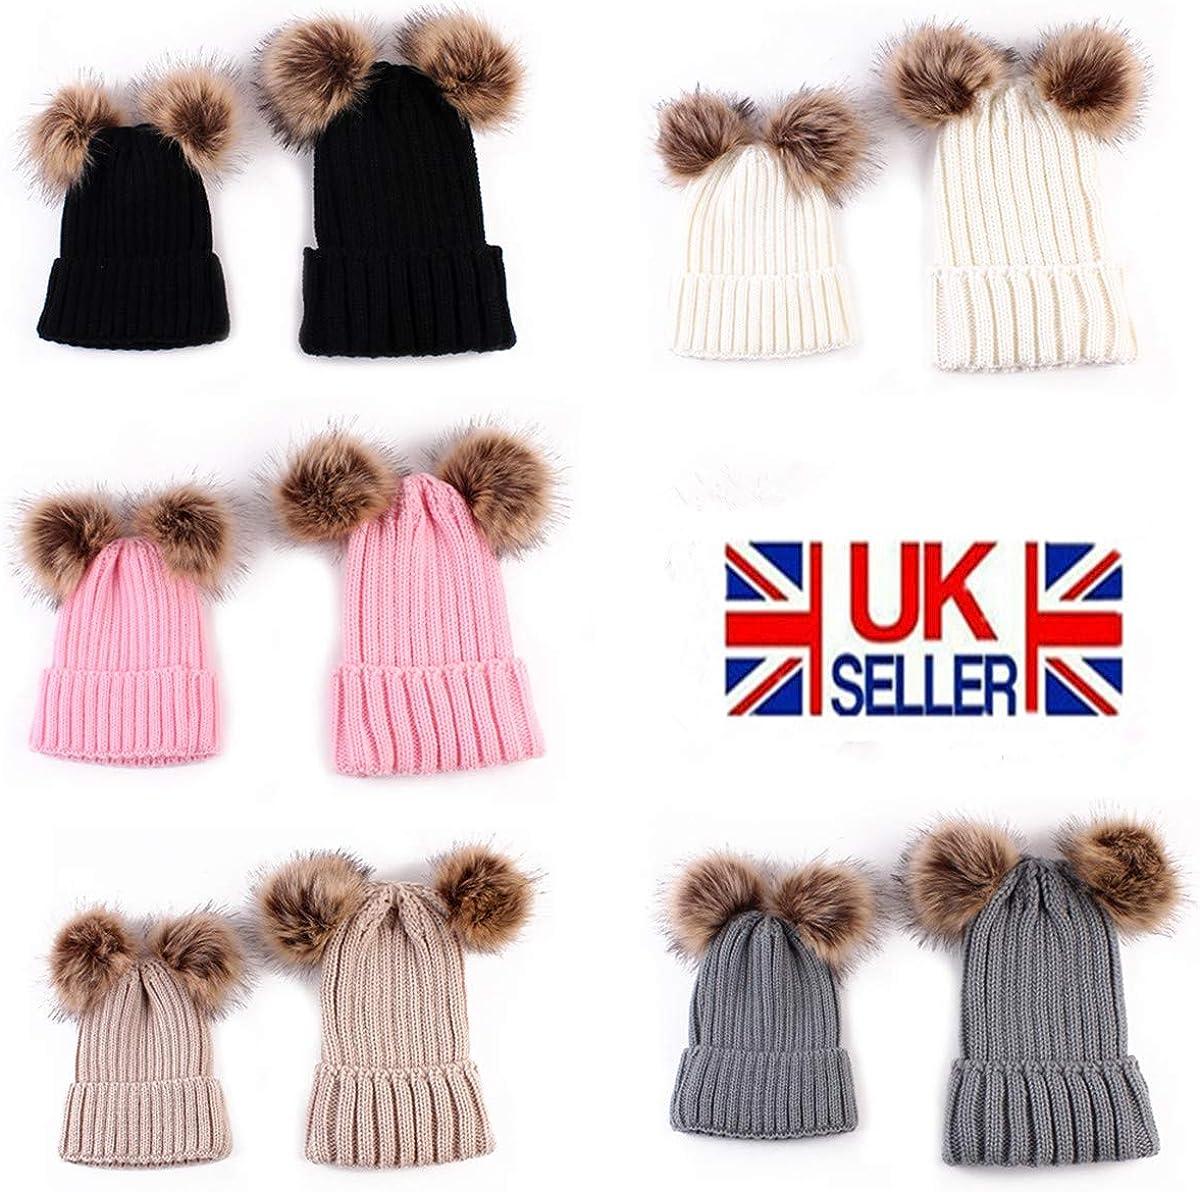 Mother /& Baby Winter Warm Knit Pom Pom Hat Family Matching Beanie Ski Cap Tabpole 2PCS Parent-Child Hat